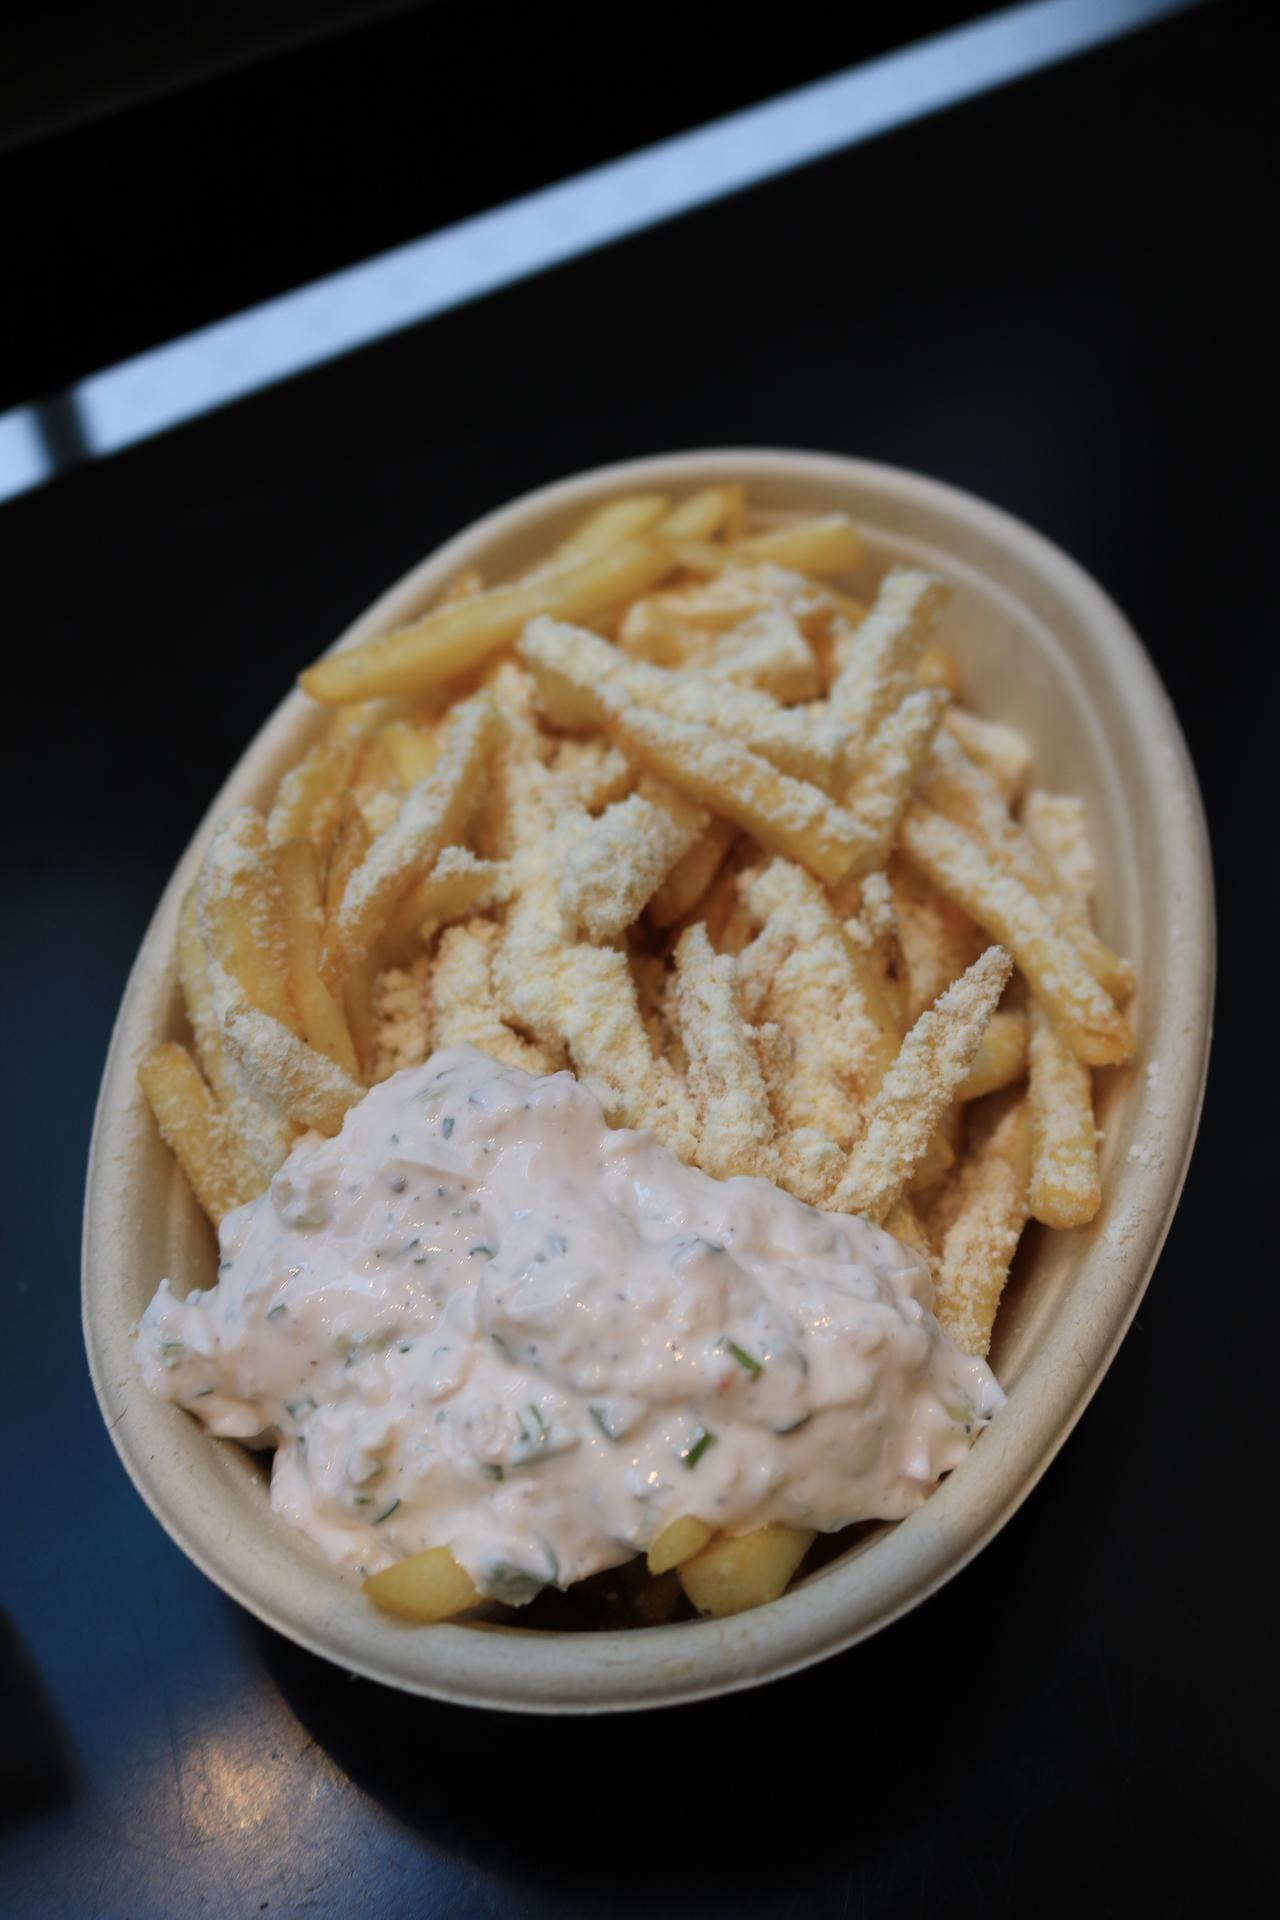 Piggie Smalls Gyro Shop Chicago fries